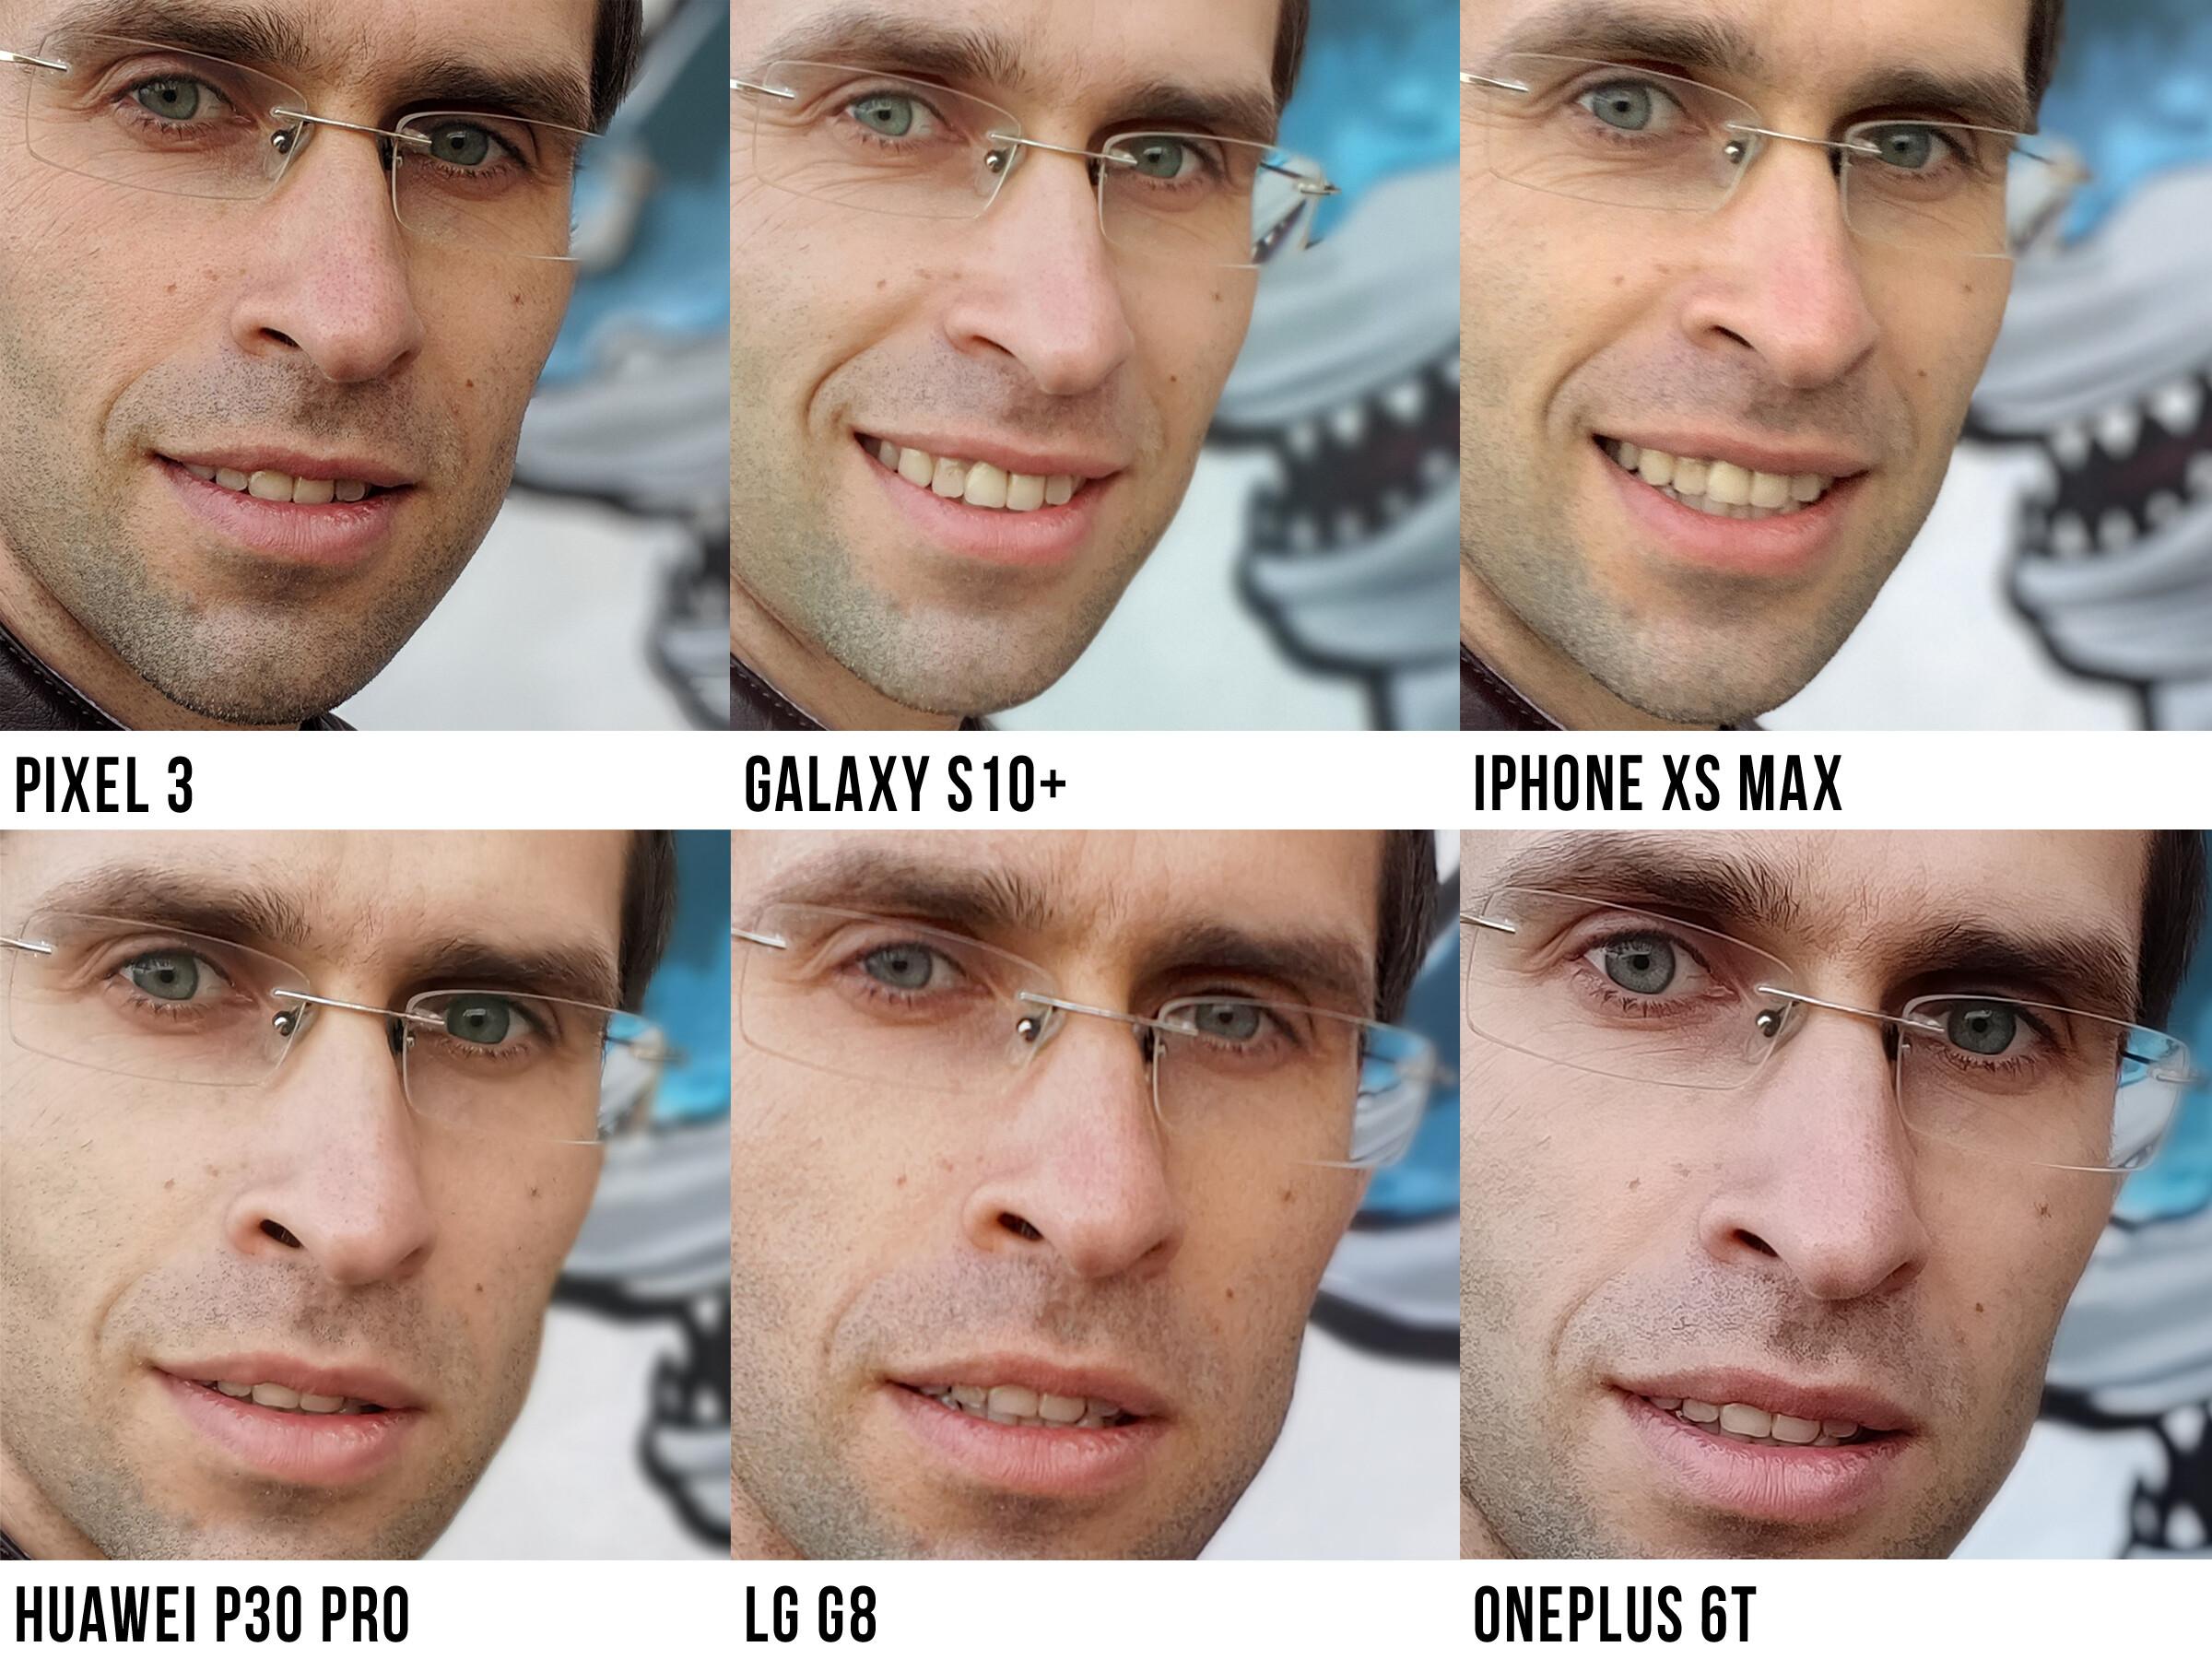 The BIG selfie comparison: Galaxy S10+ vs Pixel 3, LG G8, iPhone XS